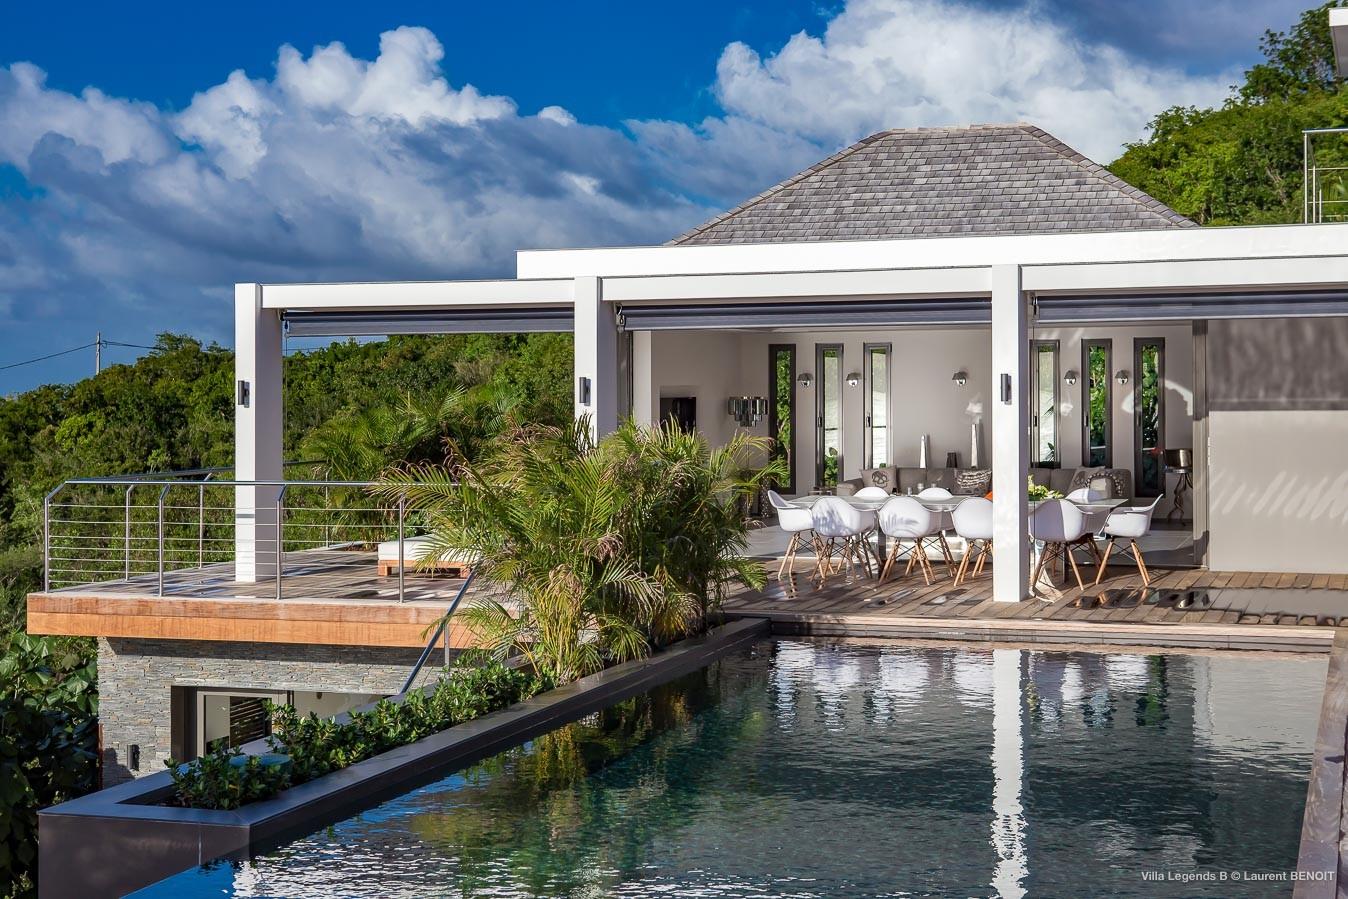 Best Island Beaches For Partying Mykonos St Barts: Villa Legends B - Lurin